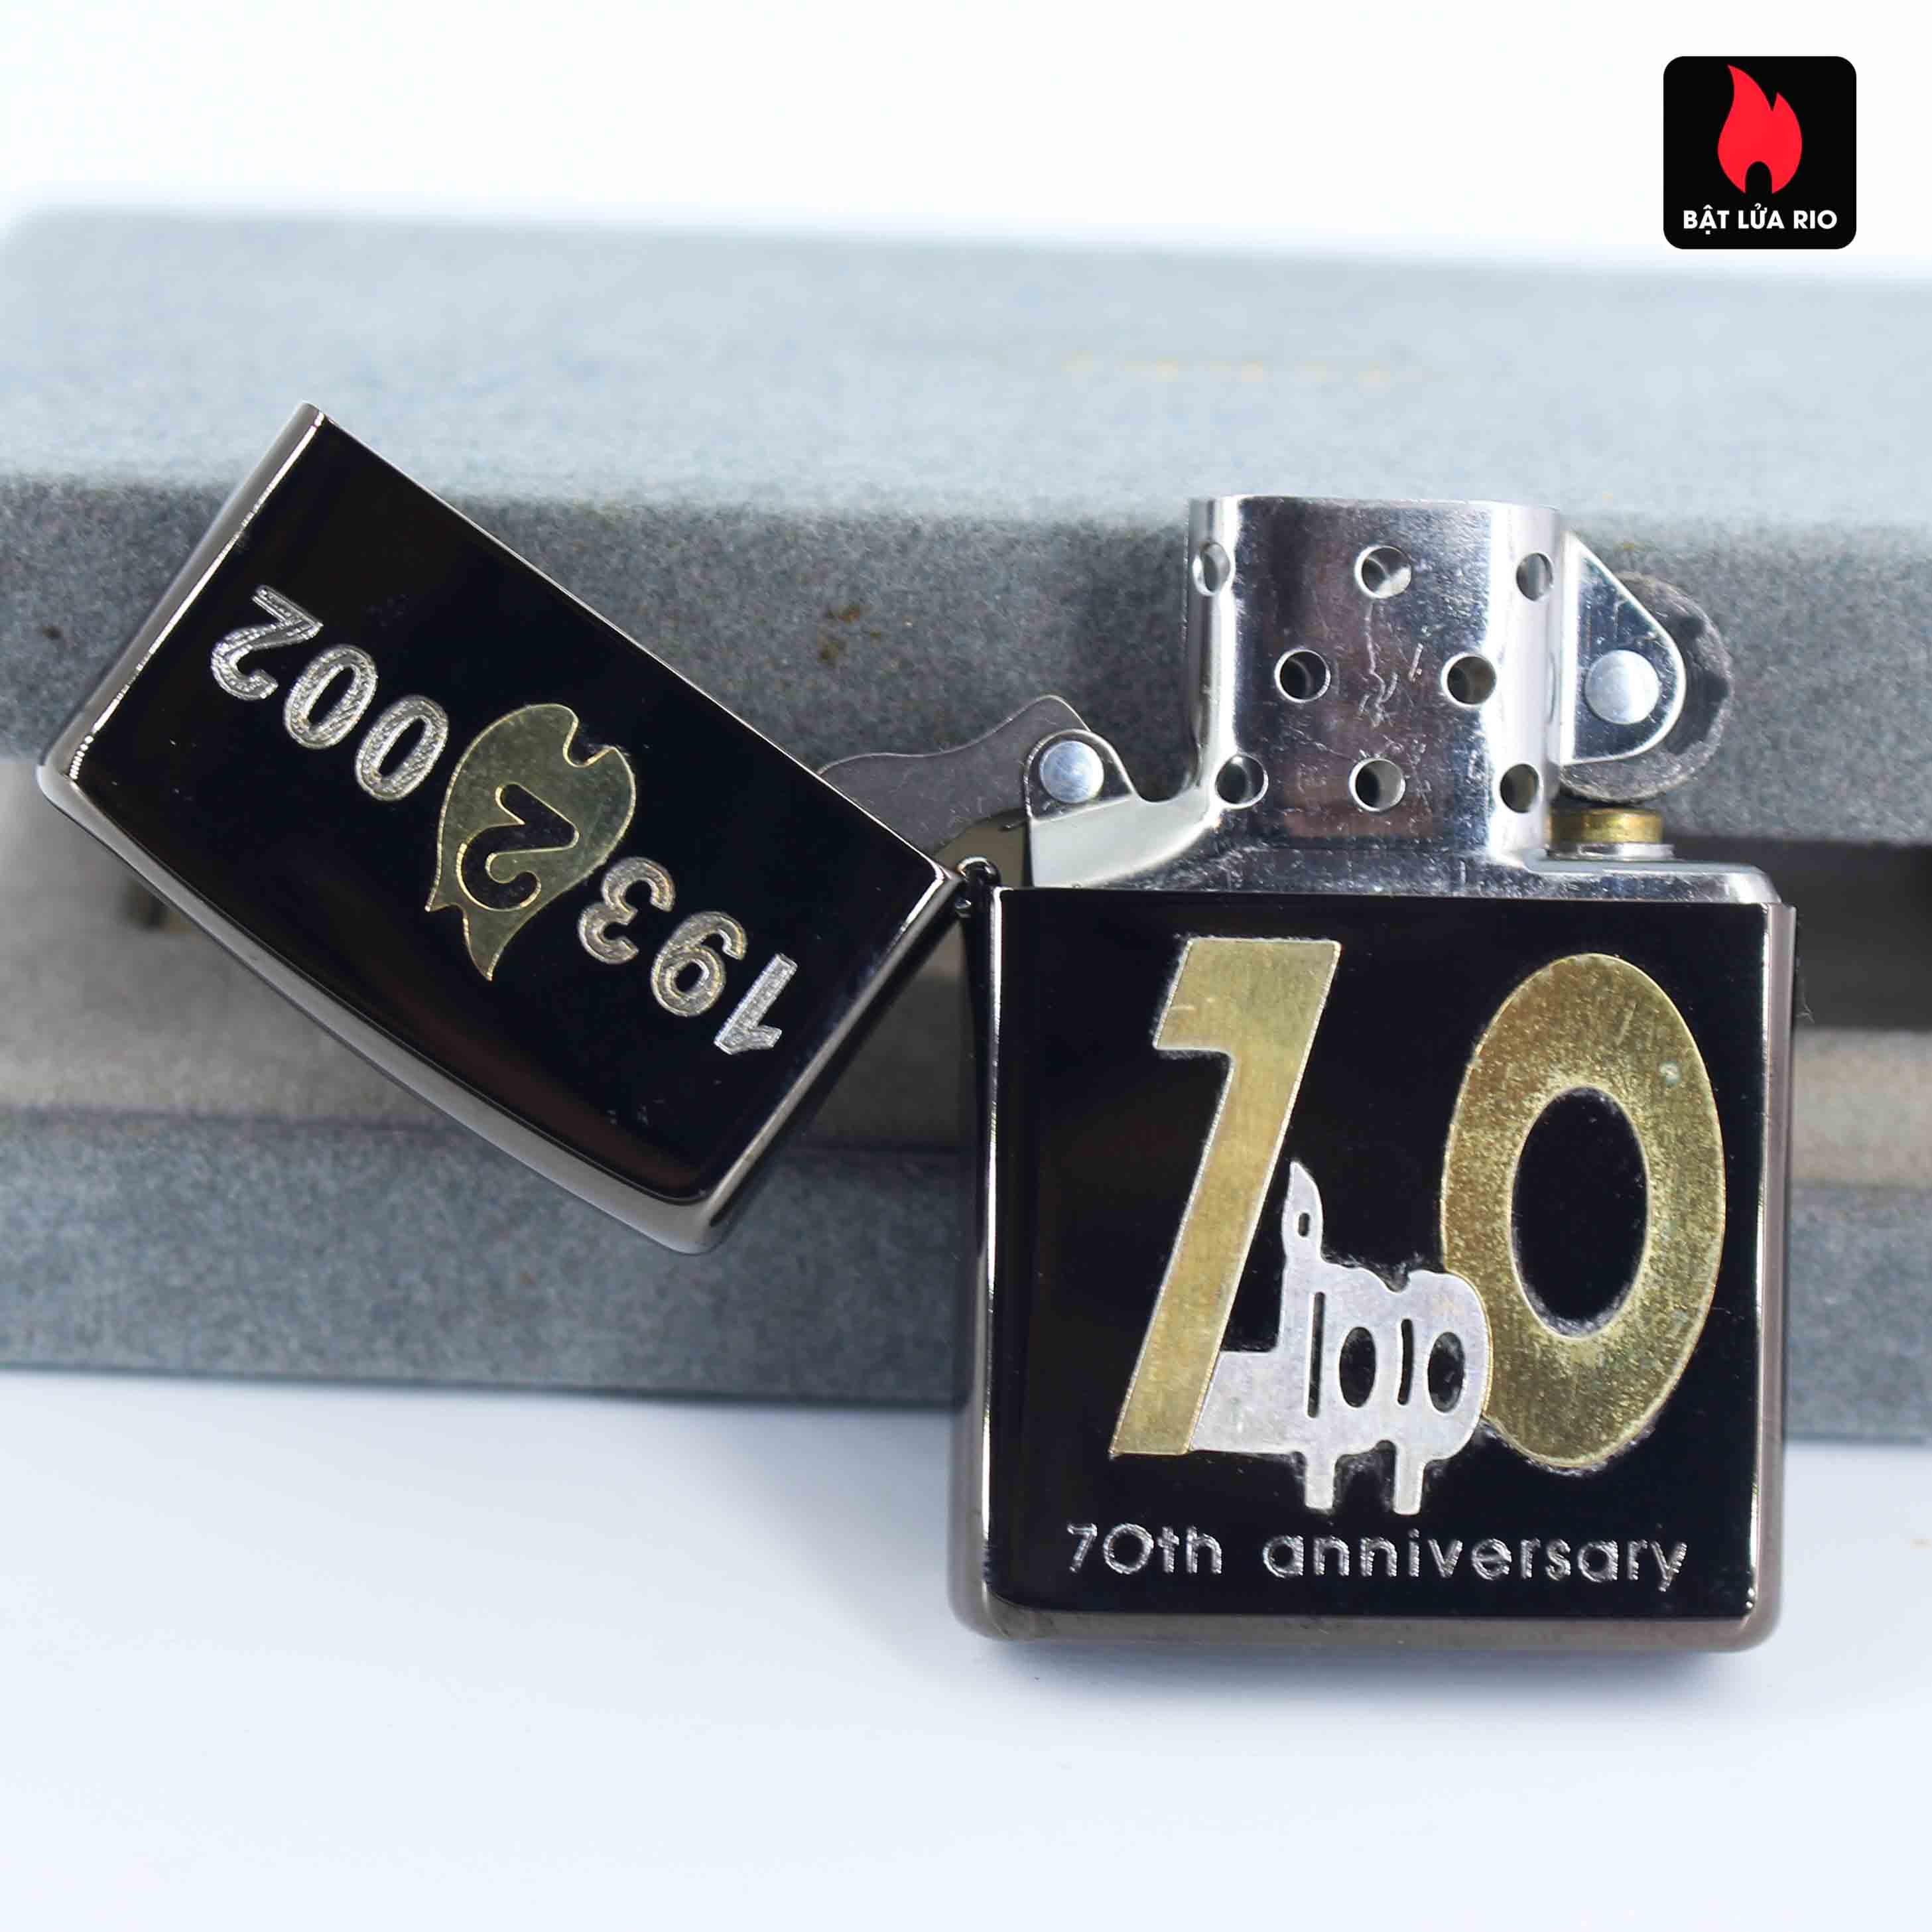 Zippo 2001 - 70th Anniversary - Limited 174/700 6